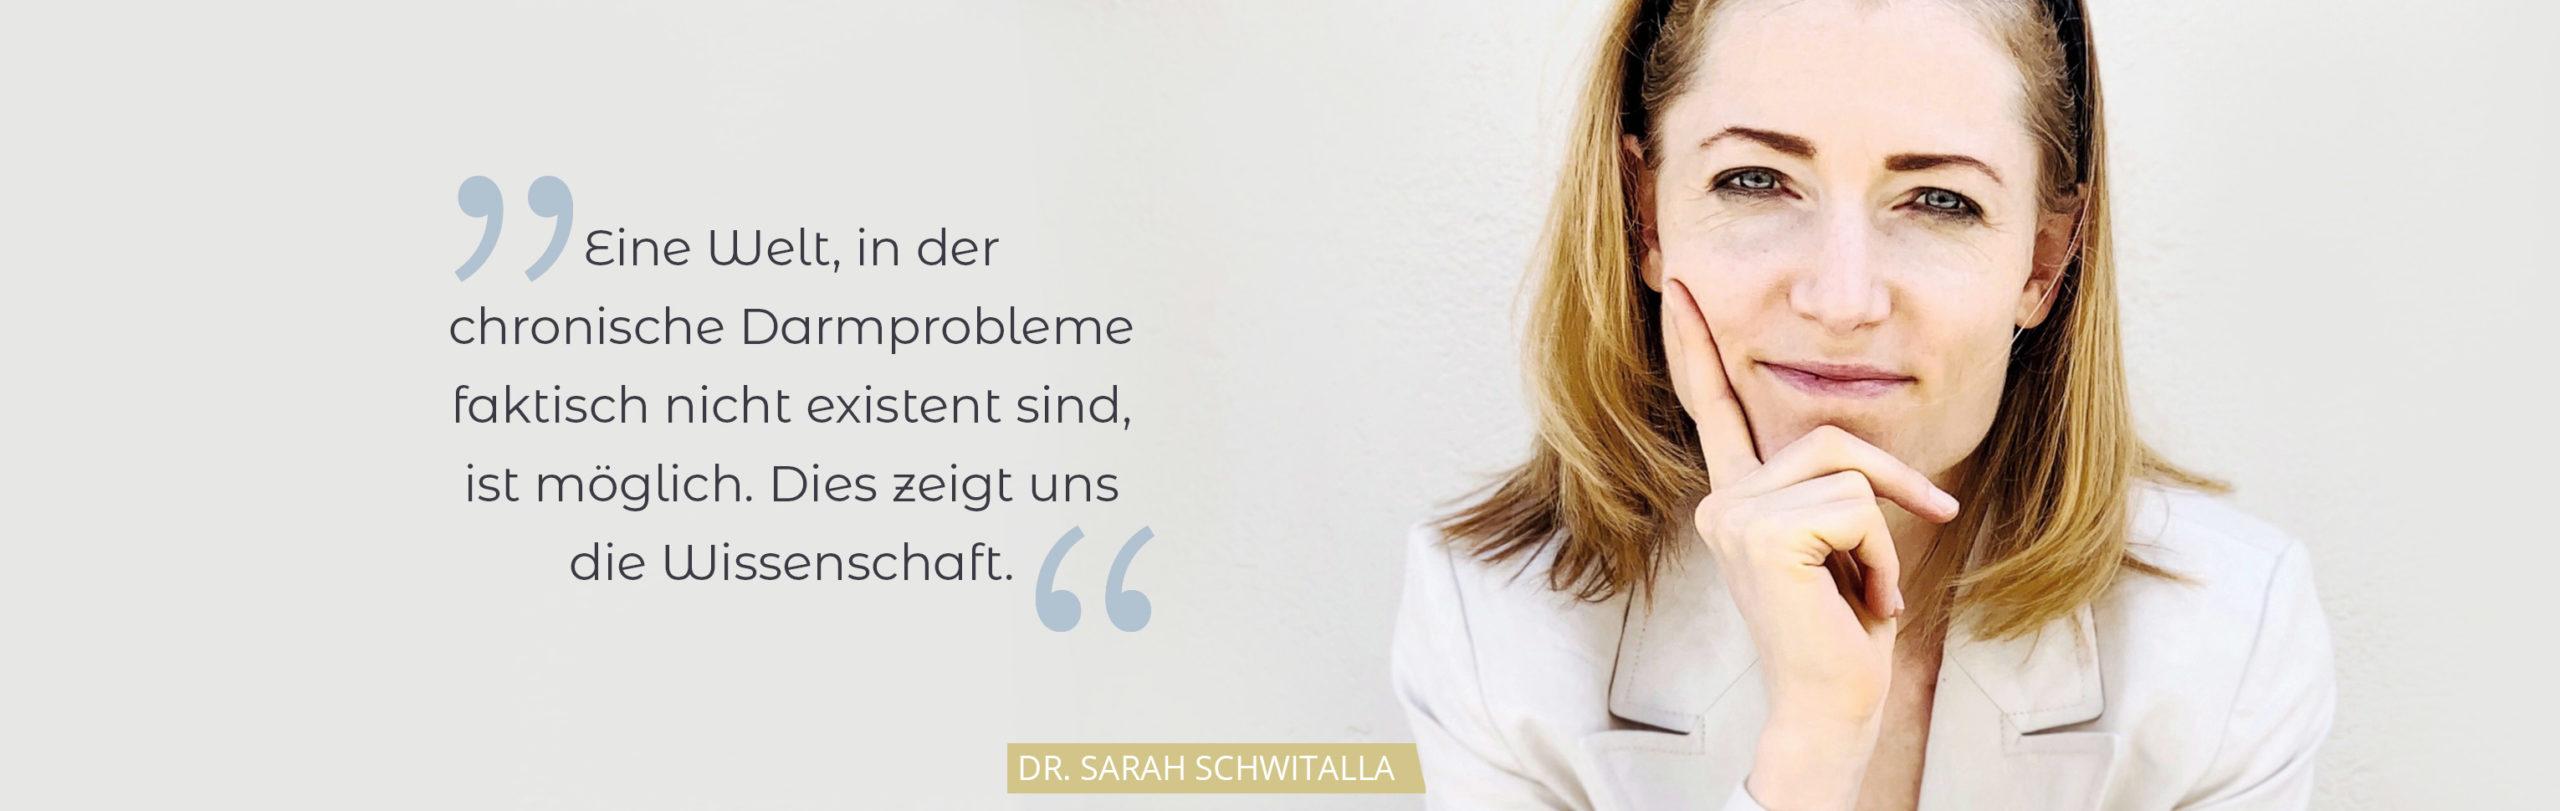 Dr Sarah Schwitalla